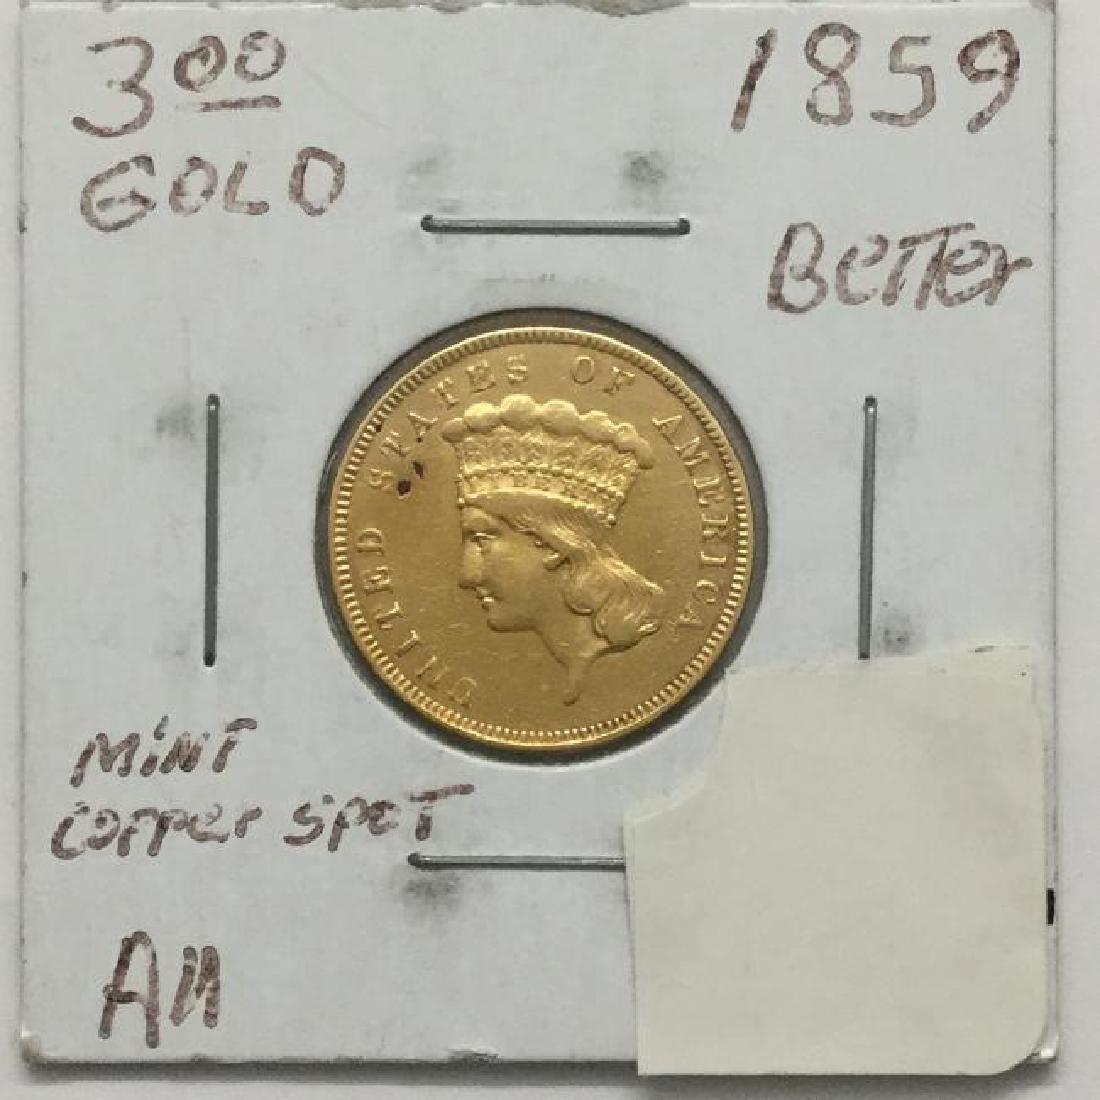 1859 $3 Princess Copper Spot Original Coin